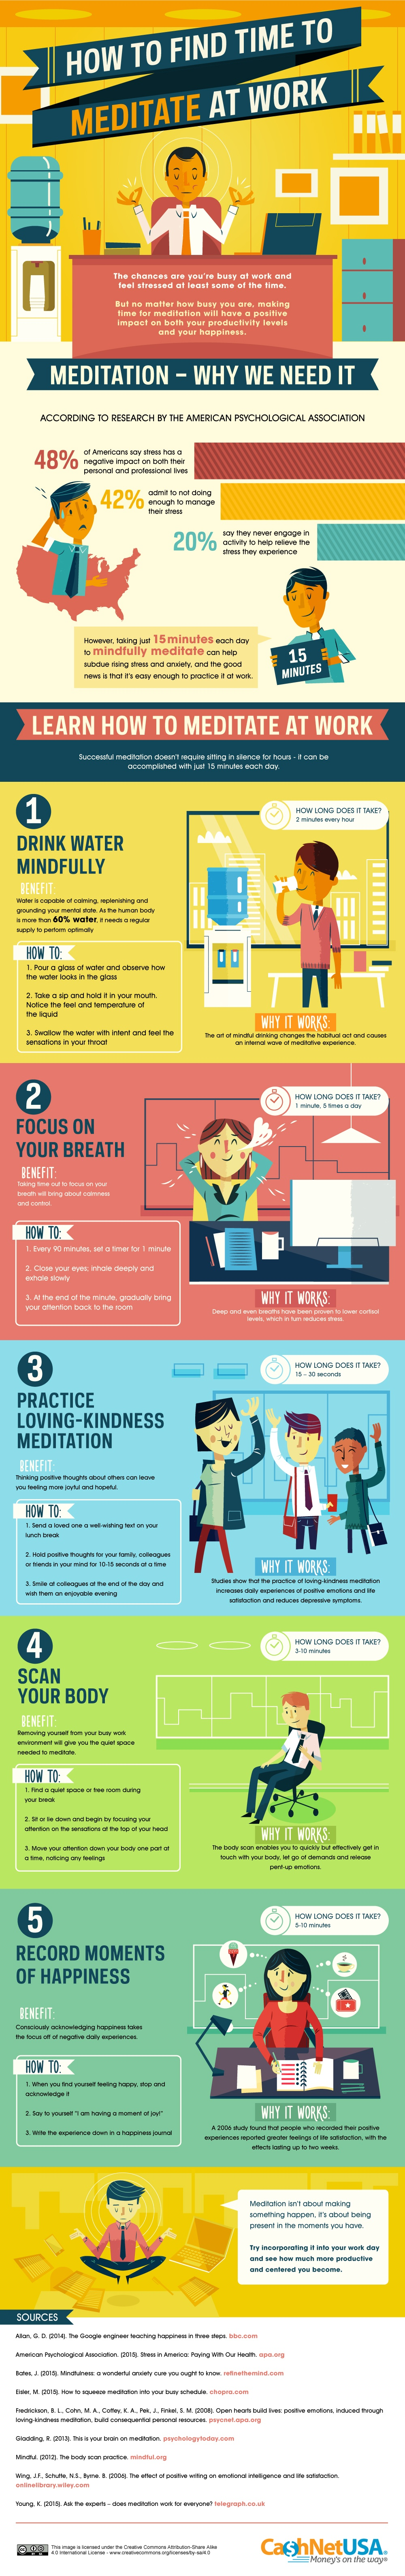 meditation-at-work-infographic.jpg